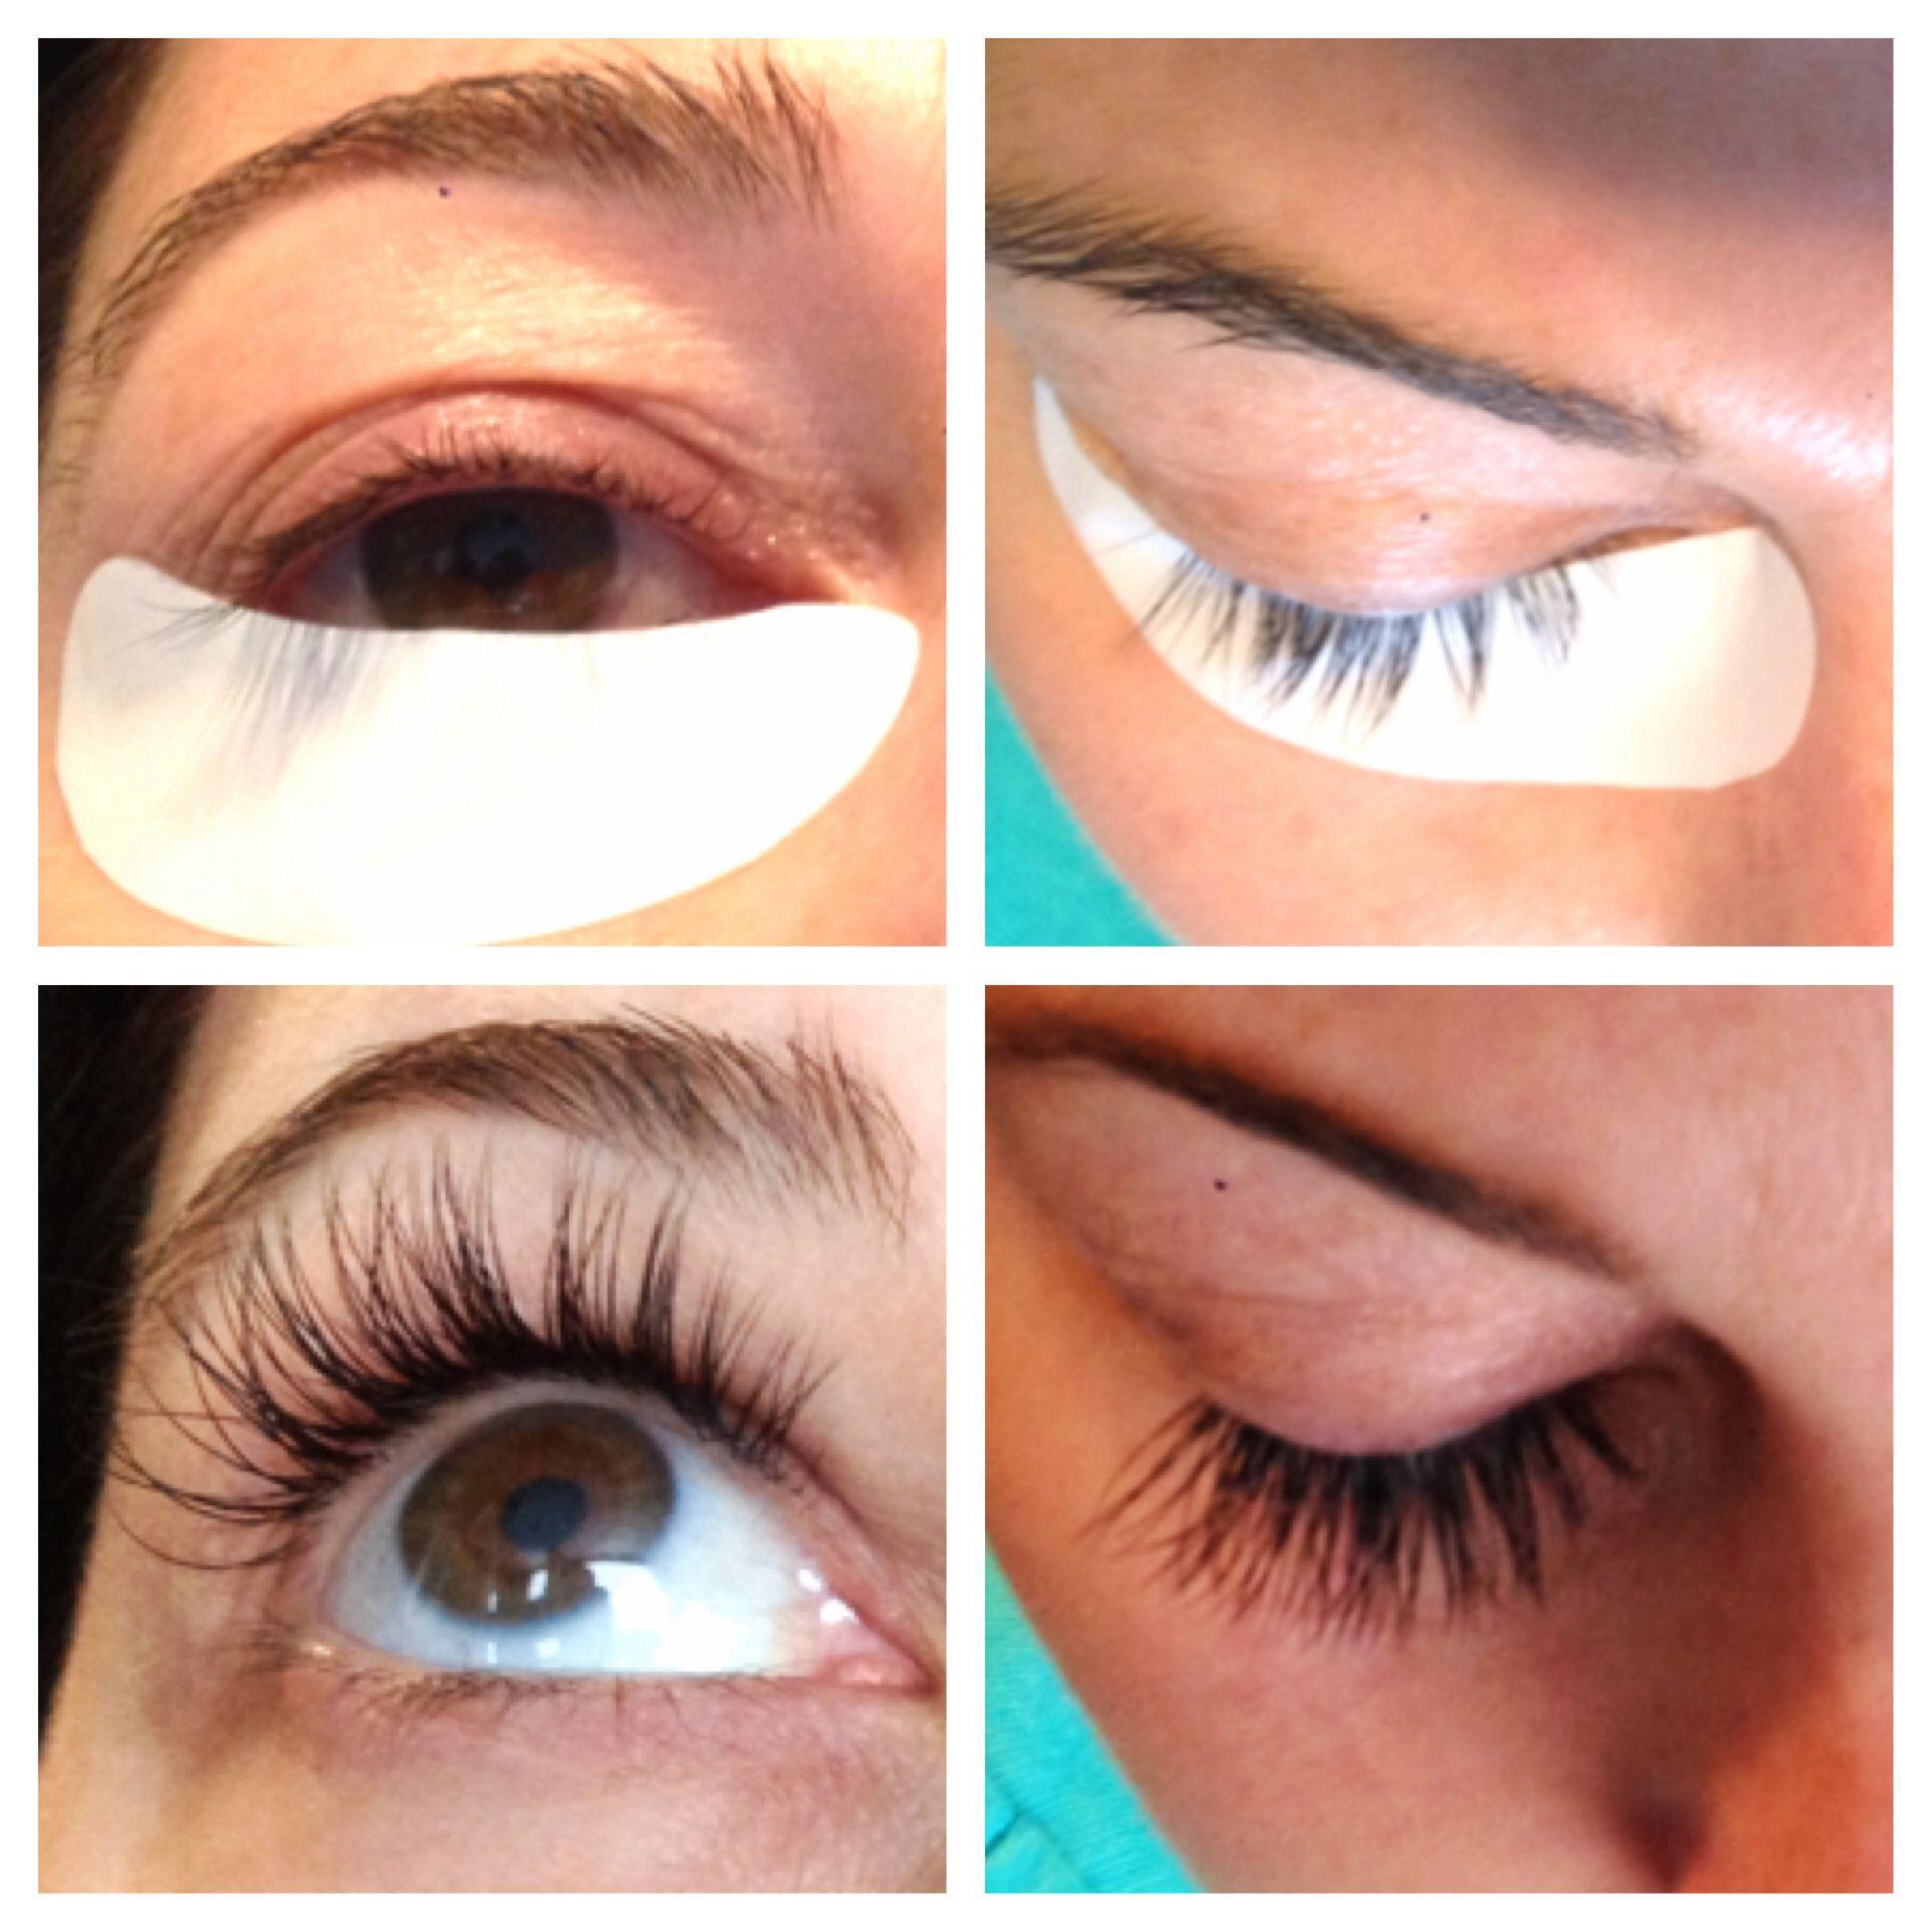 Full Set Xtreme Eyelash Extensions I Used A Longer Lash For The